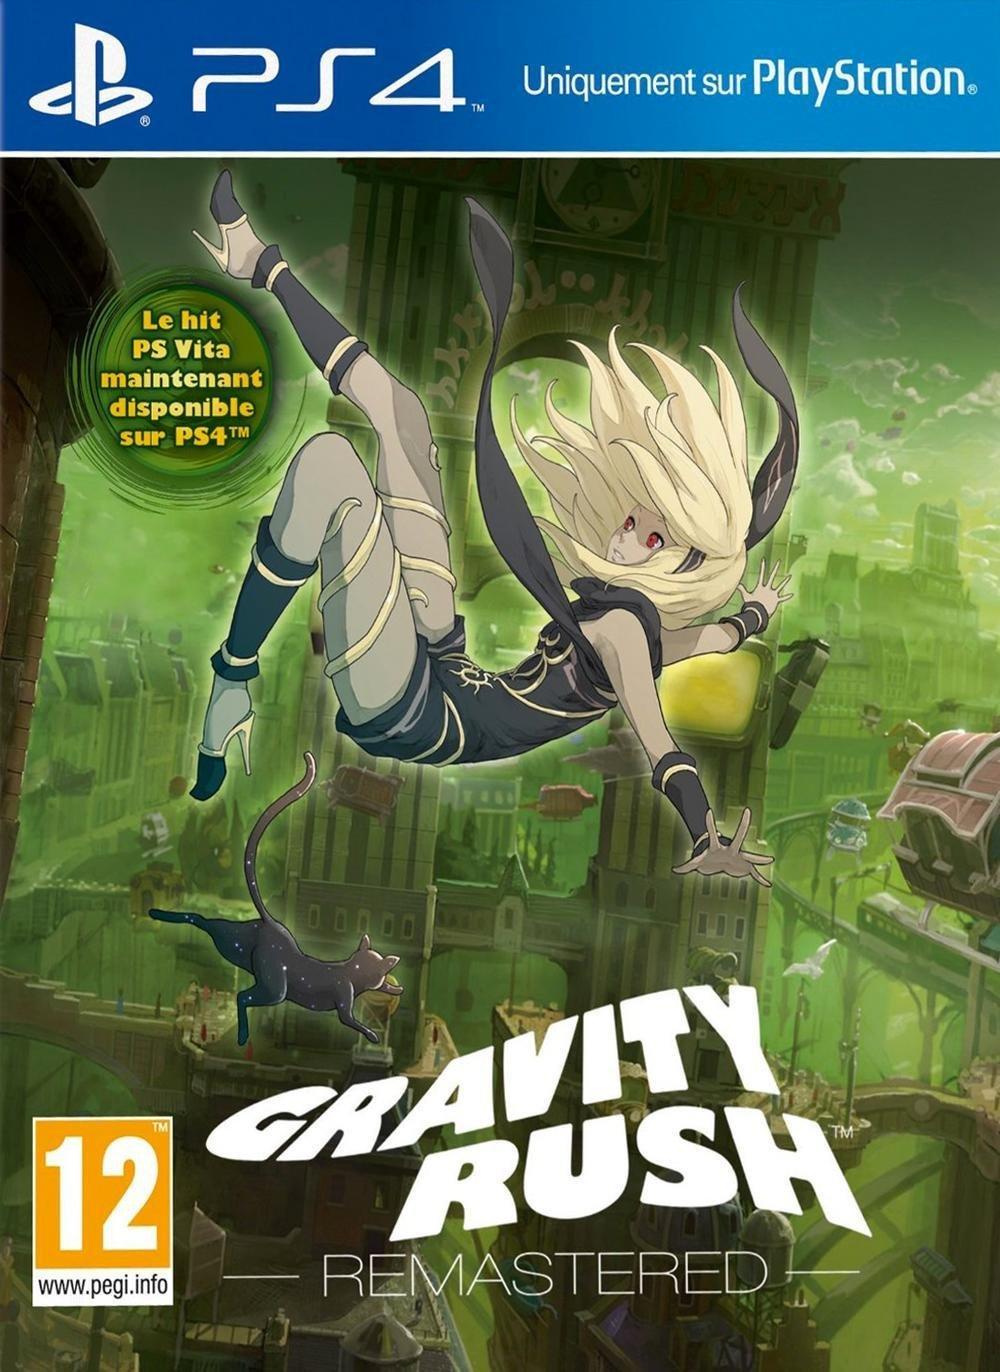 Jeu Gravity Rush Remastered sur PS4